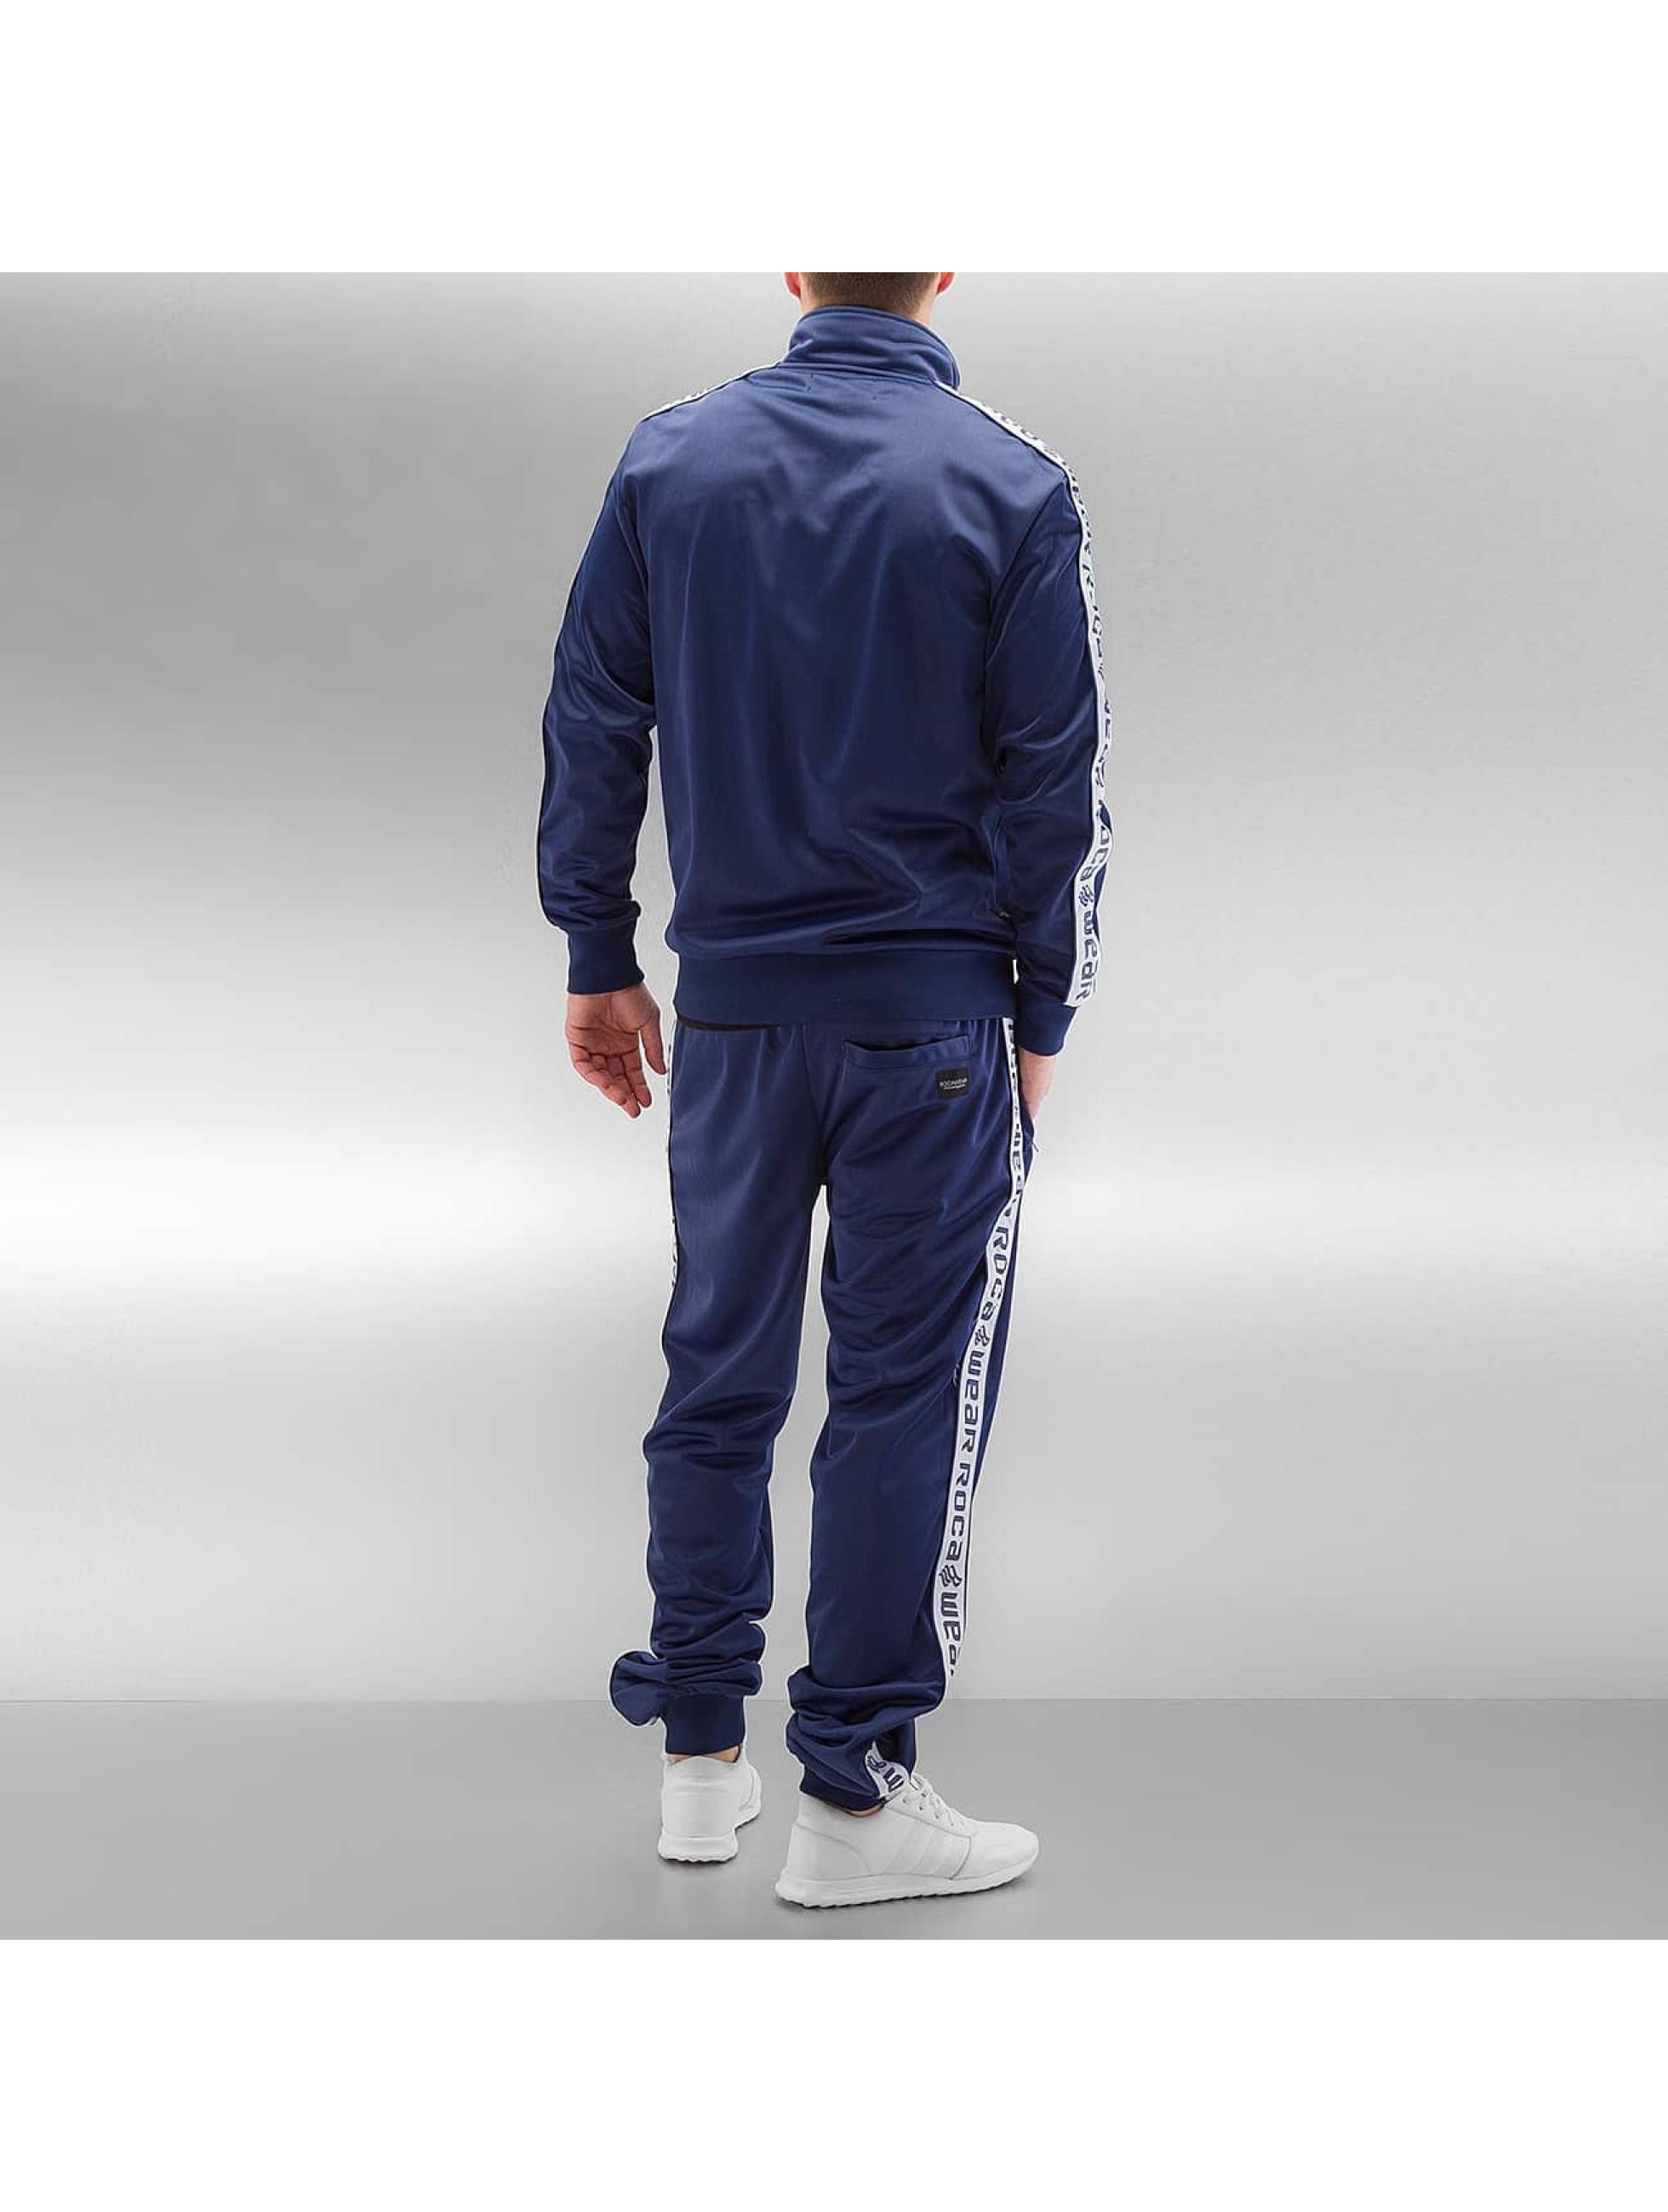 Rocawear Suits Logo blue